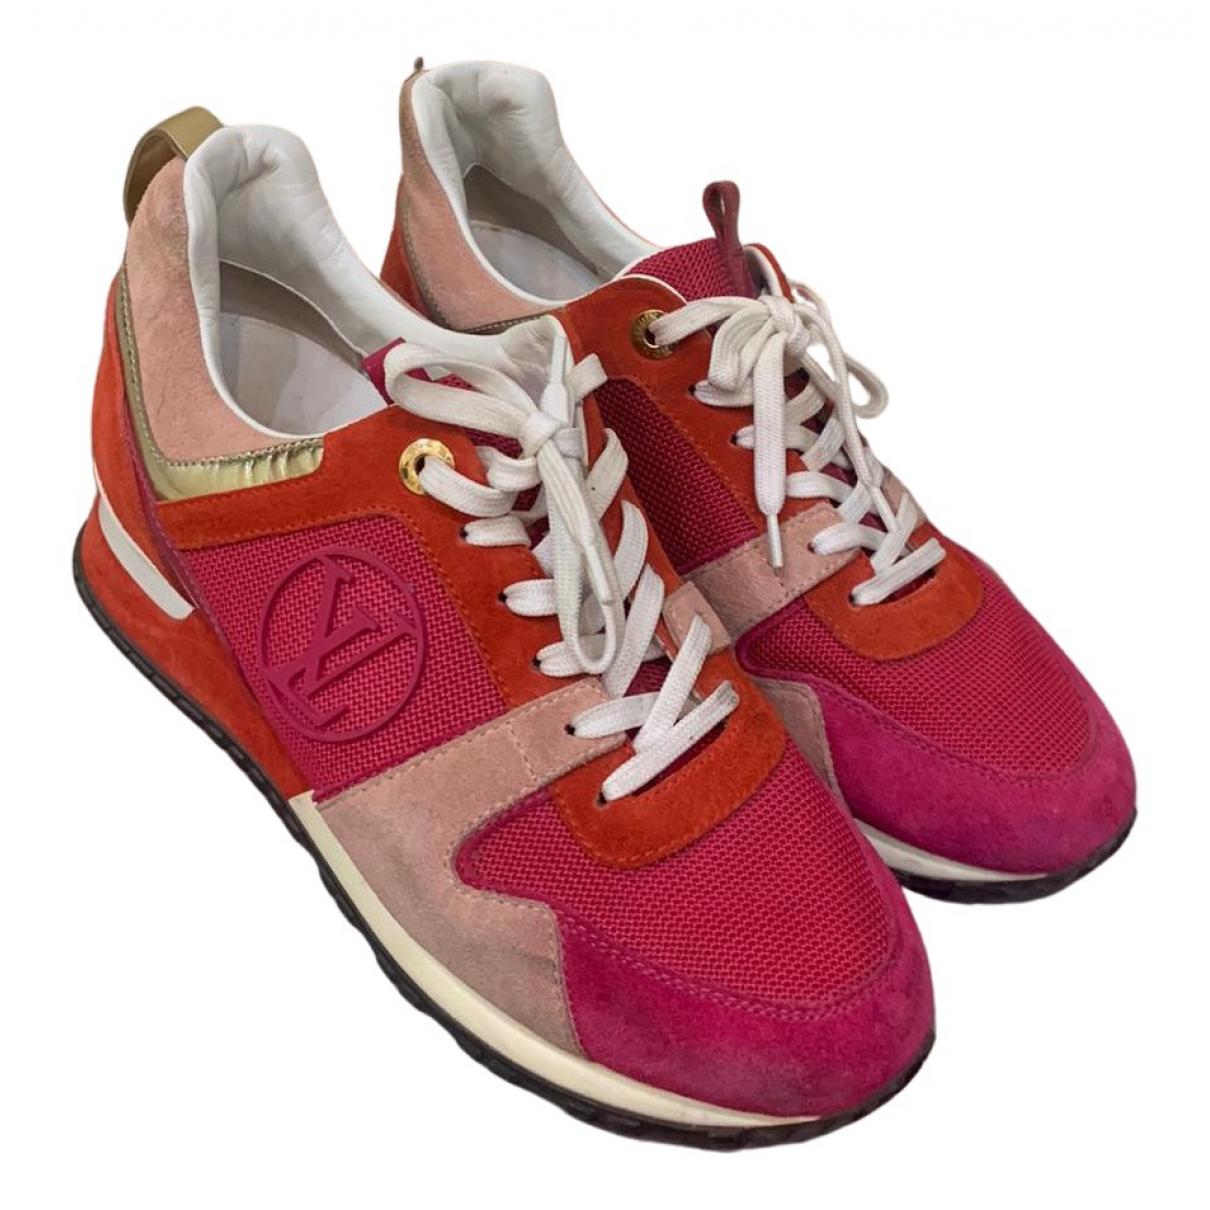 Louis Vuitton Run Away Red Leather Trainers for Women 37.5 EU